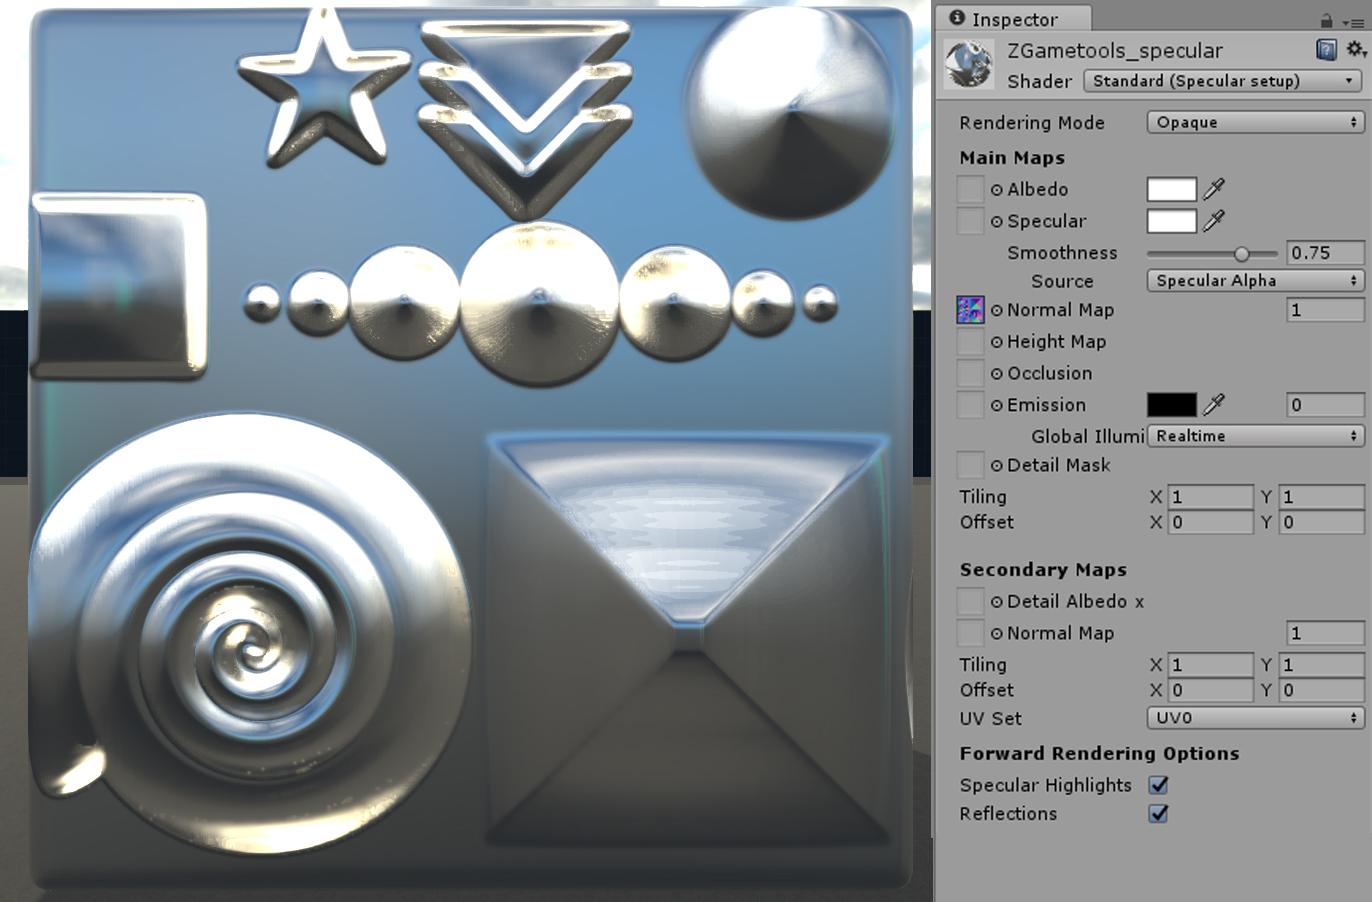 normal-map-unity3d-zgametools-pbs-specular | Puppet-Master